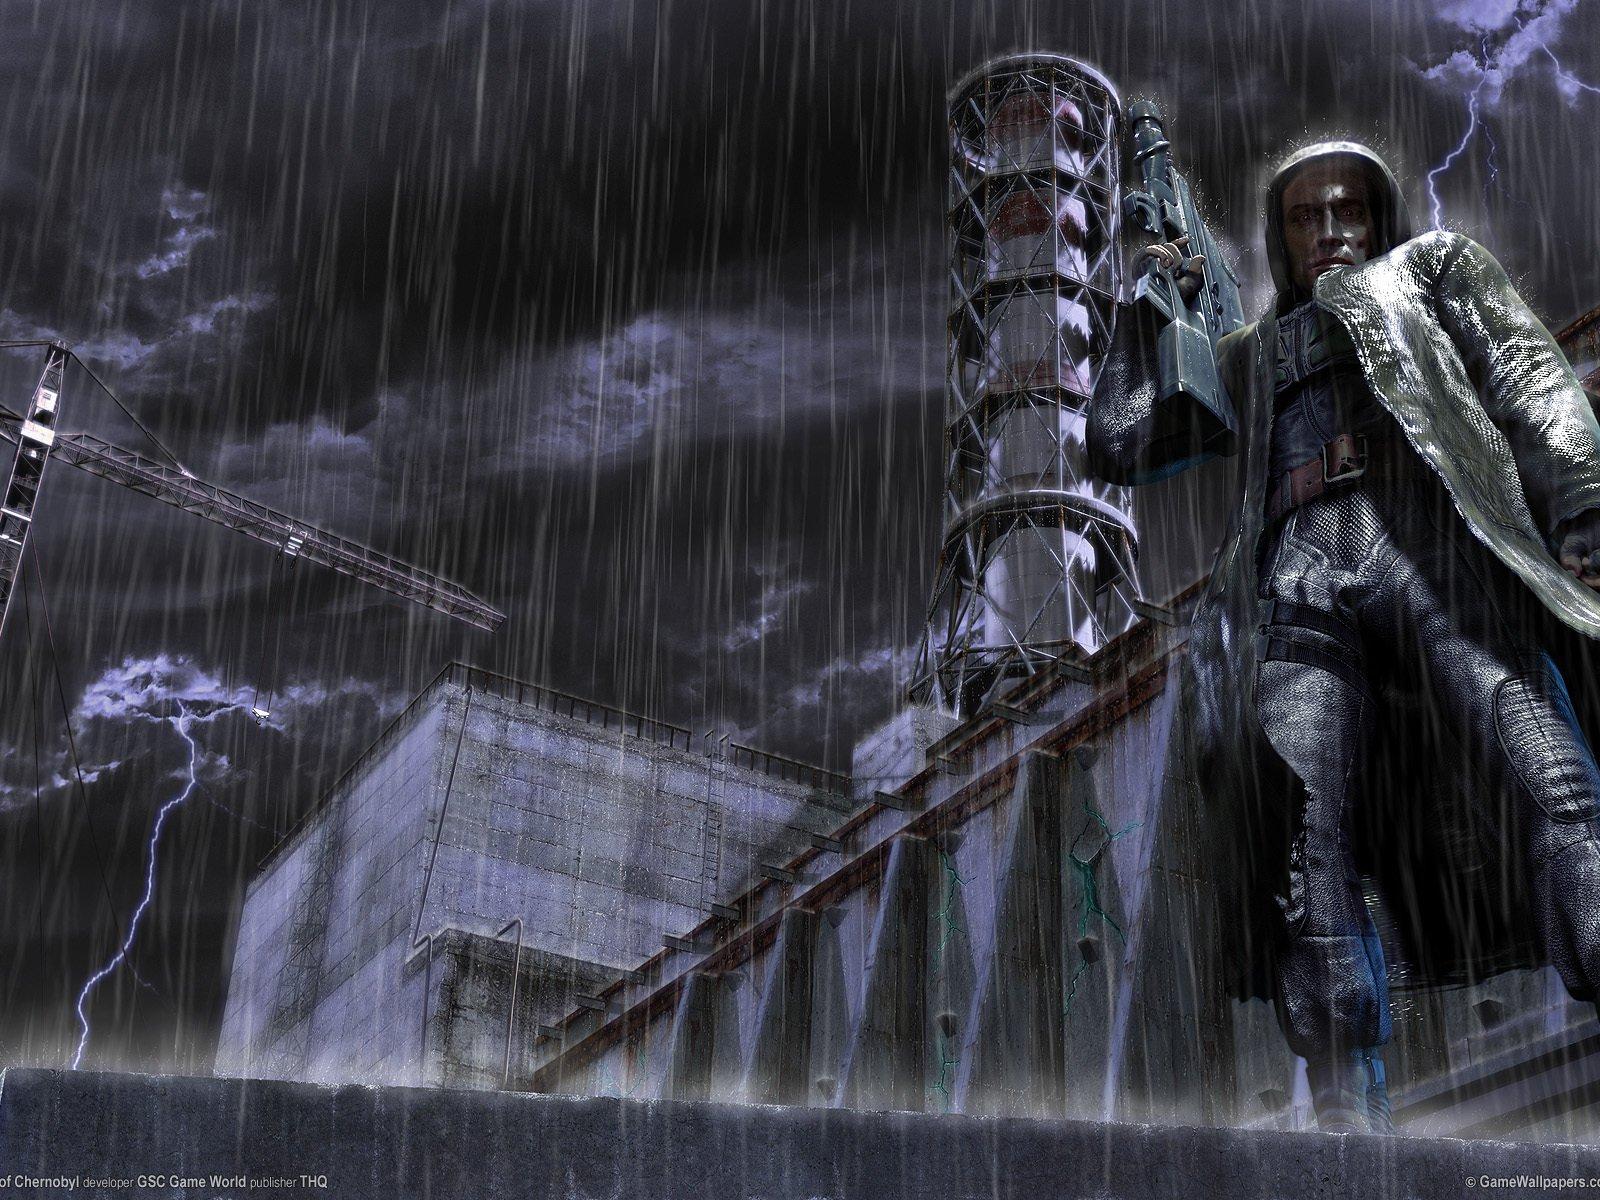 Video Game - S.T.A.L.K.E.R.  Wallpaper